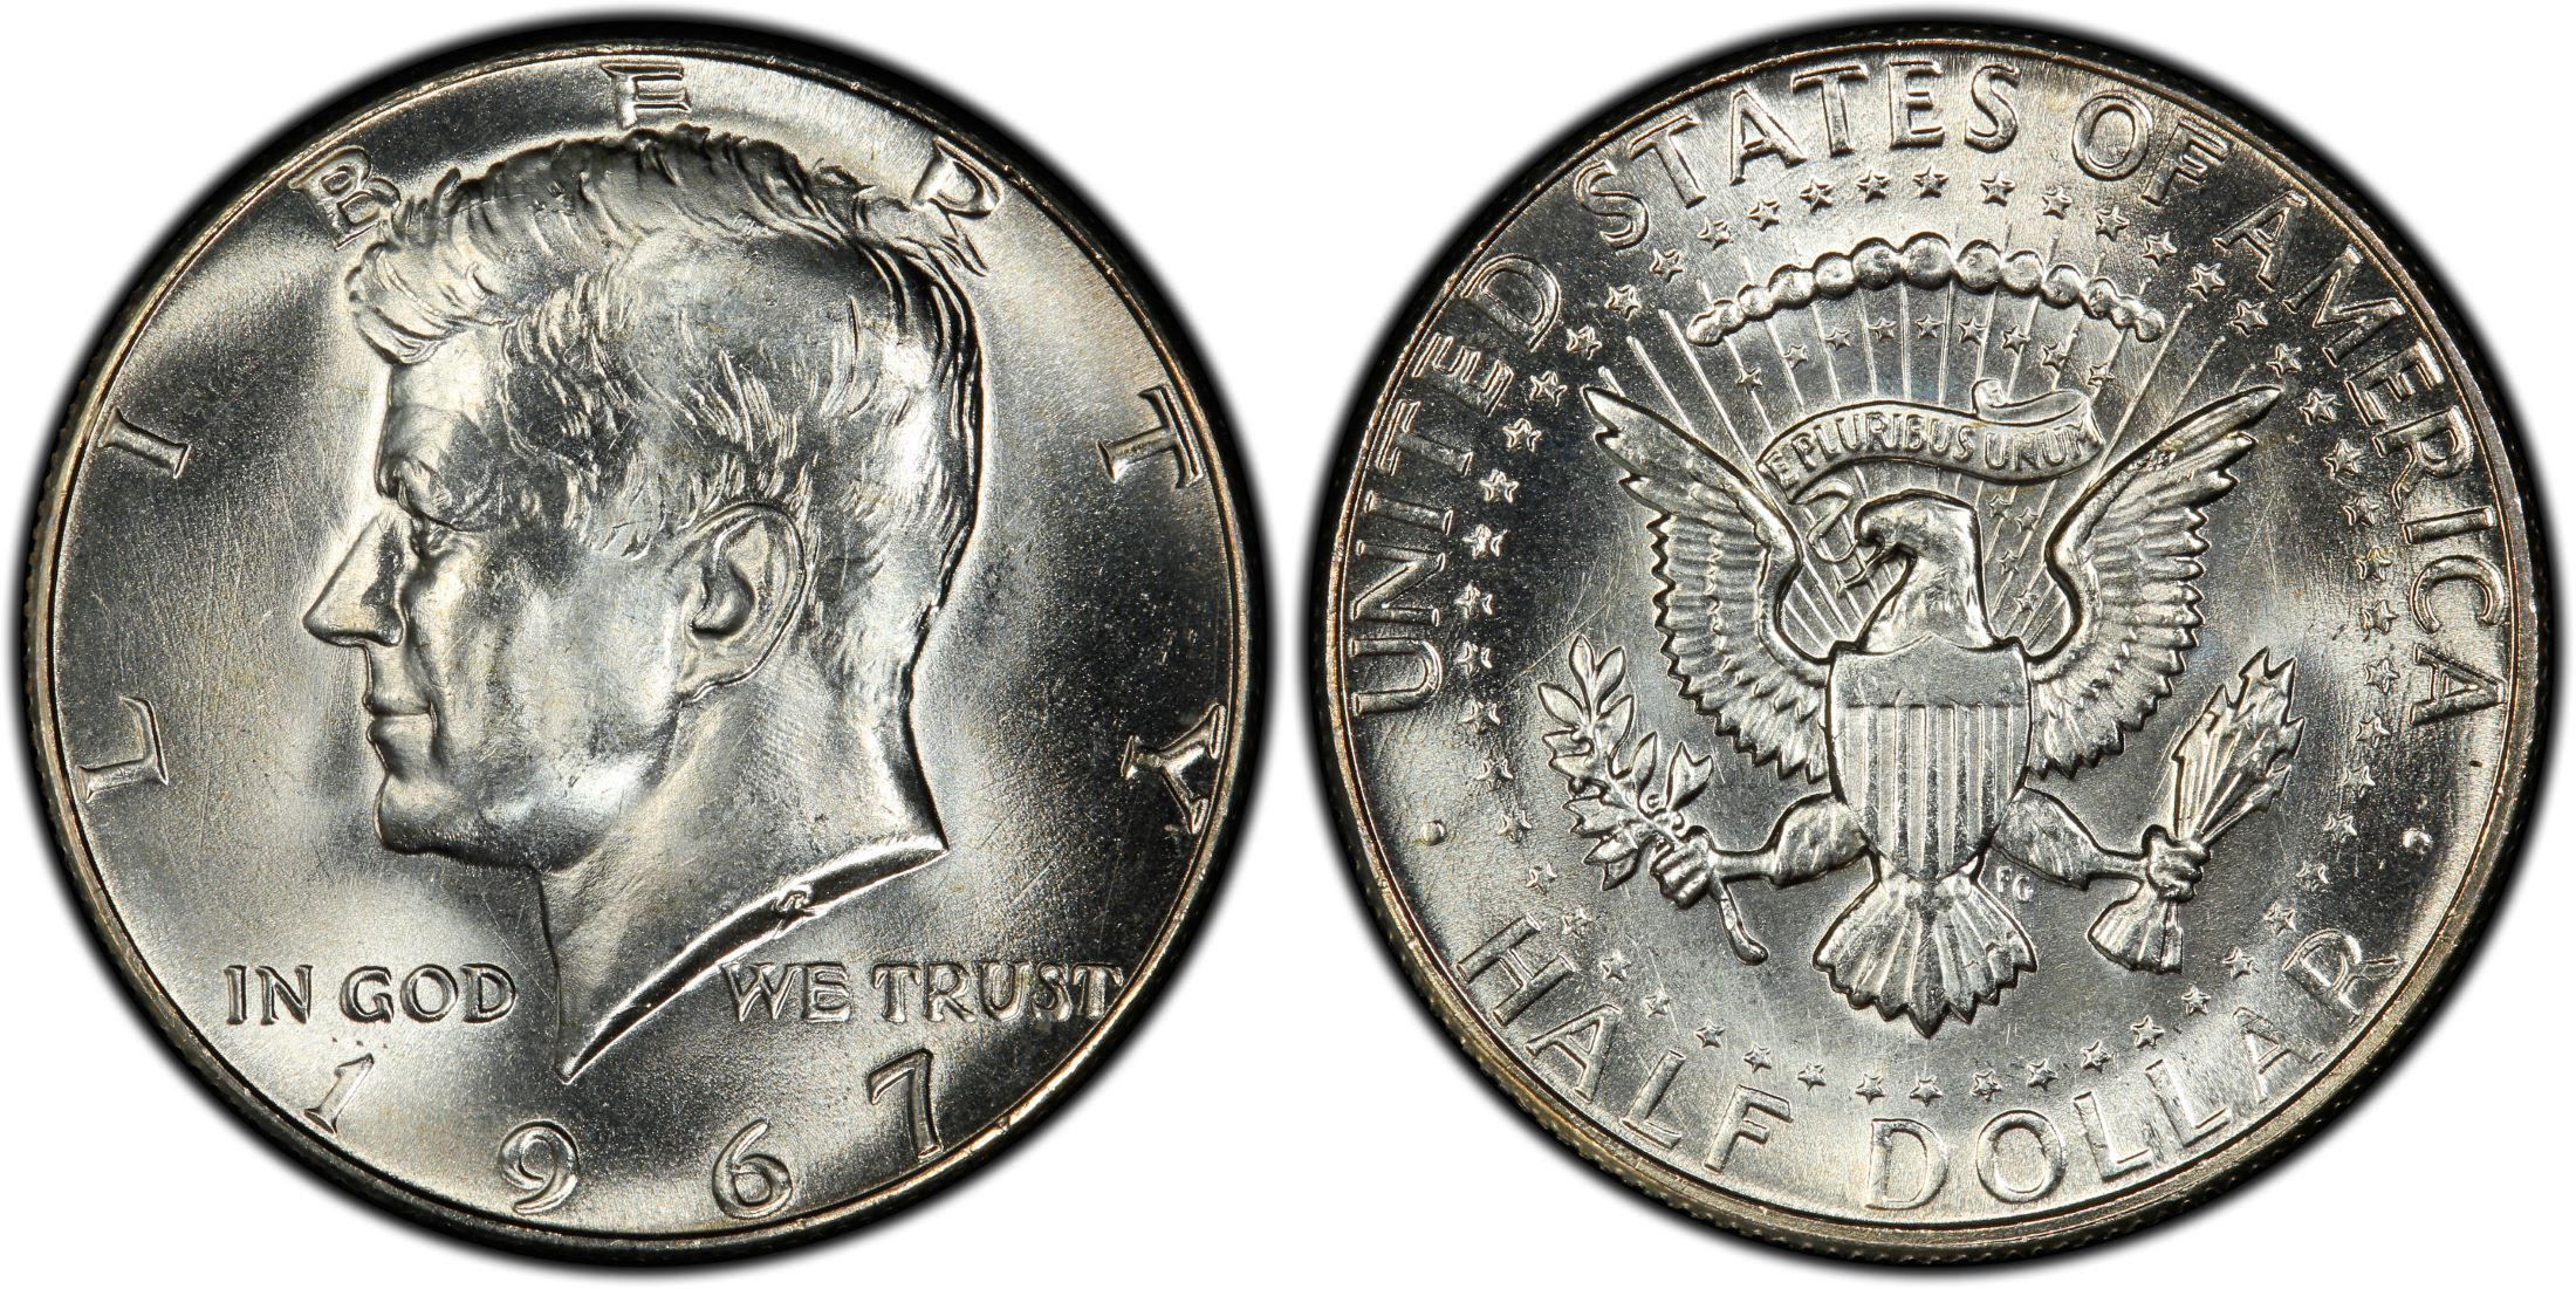 1967 50C (Regular Strike) Kennedy Half Dollar - PCGS CoinFacts